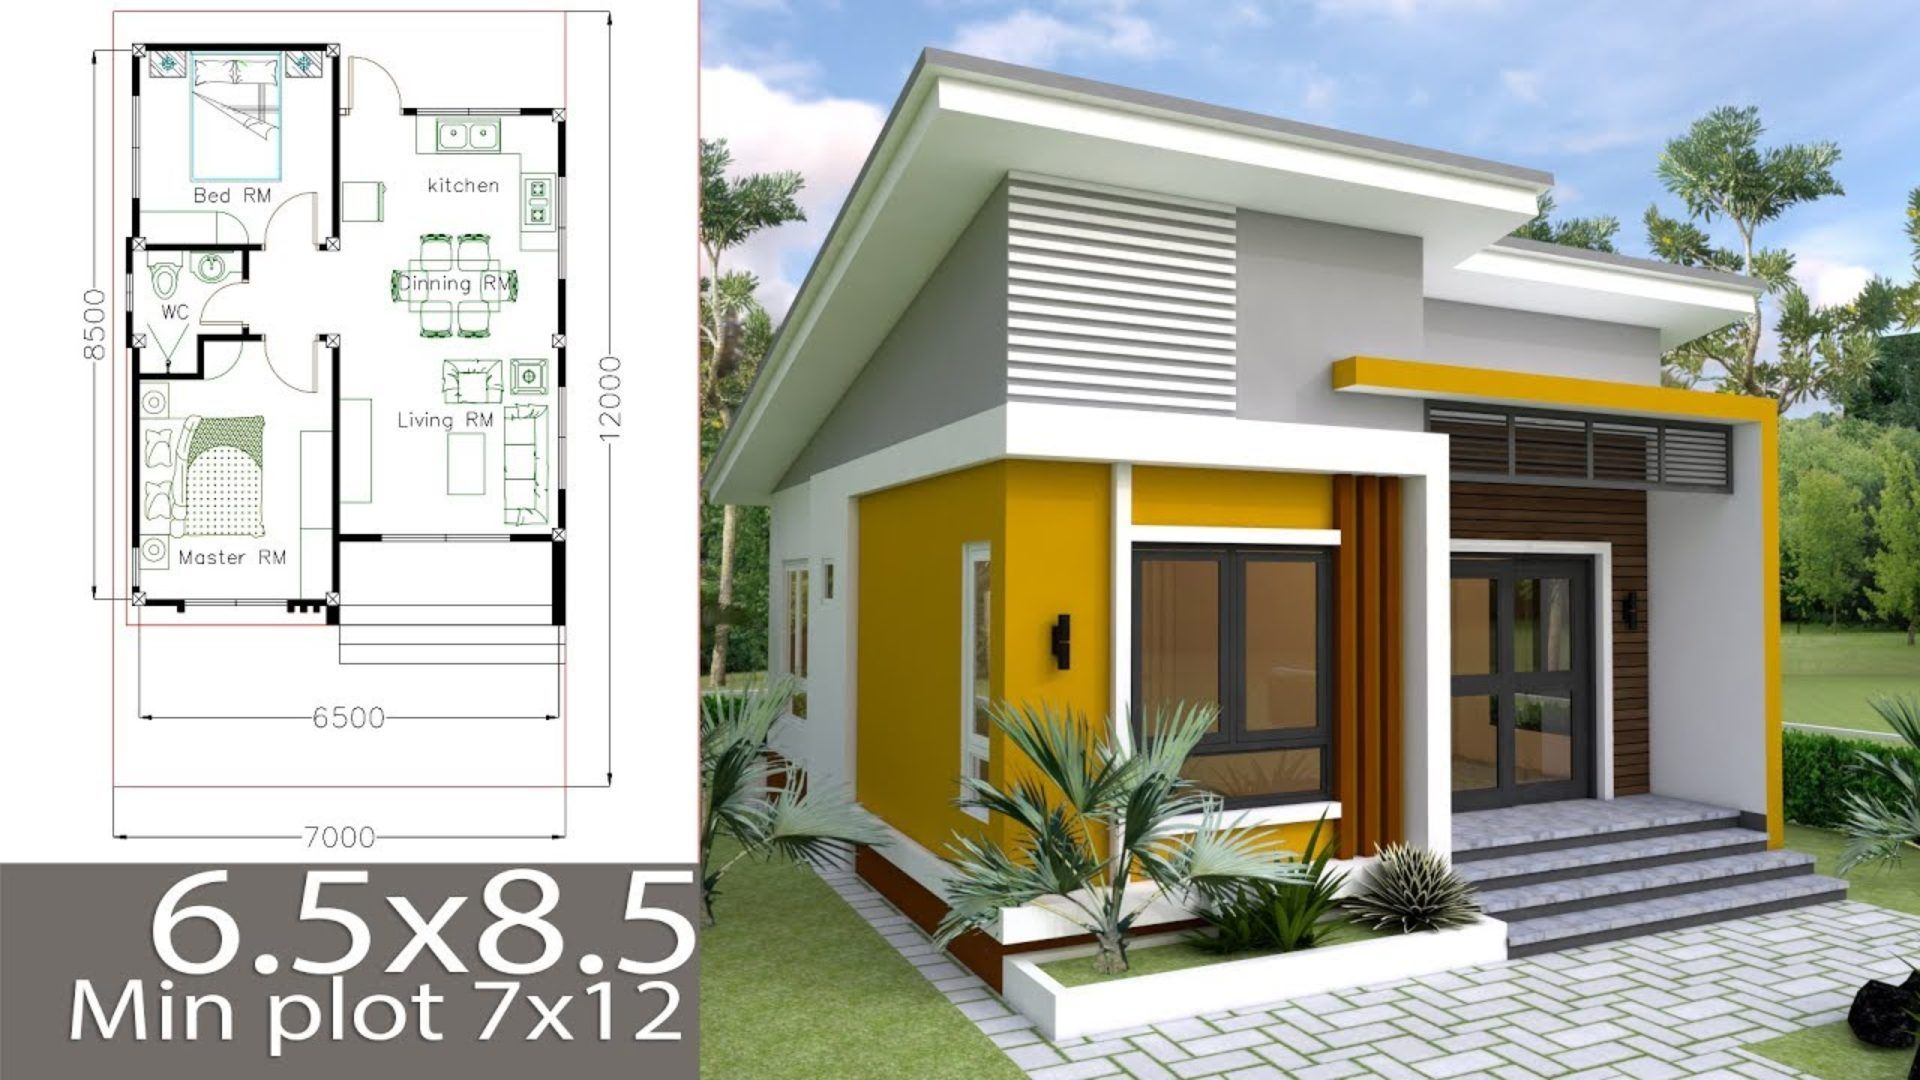 Samphoas Plan Small House Design Simple House Design House Plans